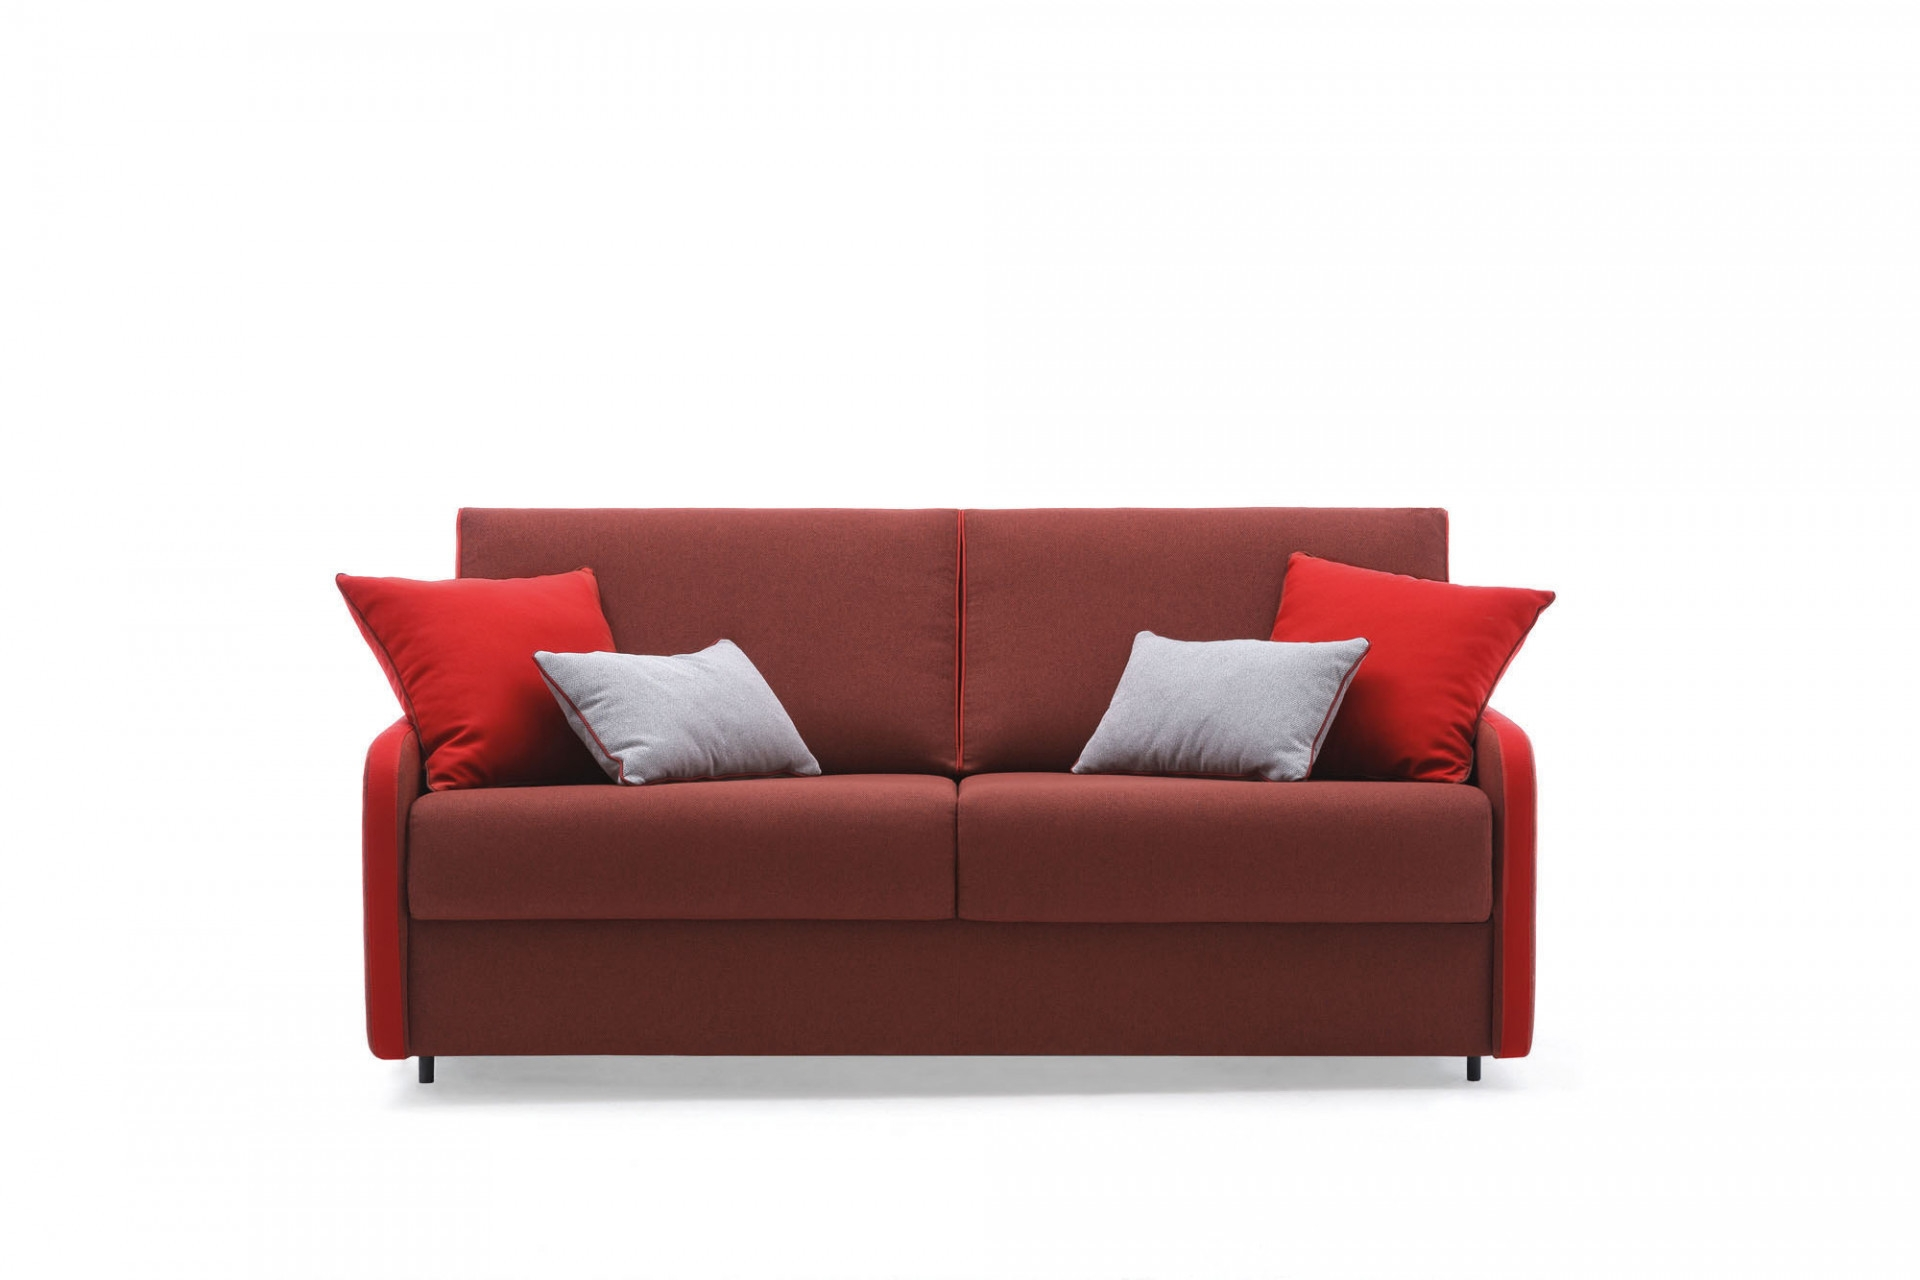 Canapea extensibila 3 locuri, tapitata cu stofa, Santorini Rosu, l180xA96xH94 cm